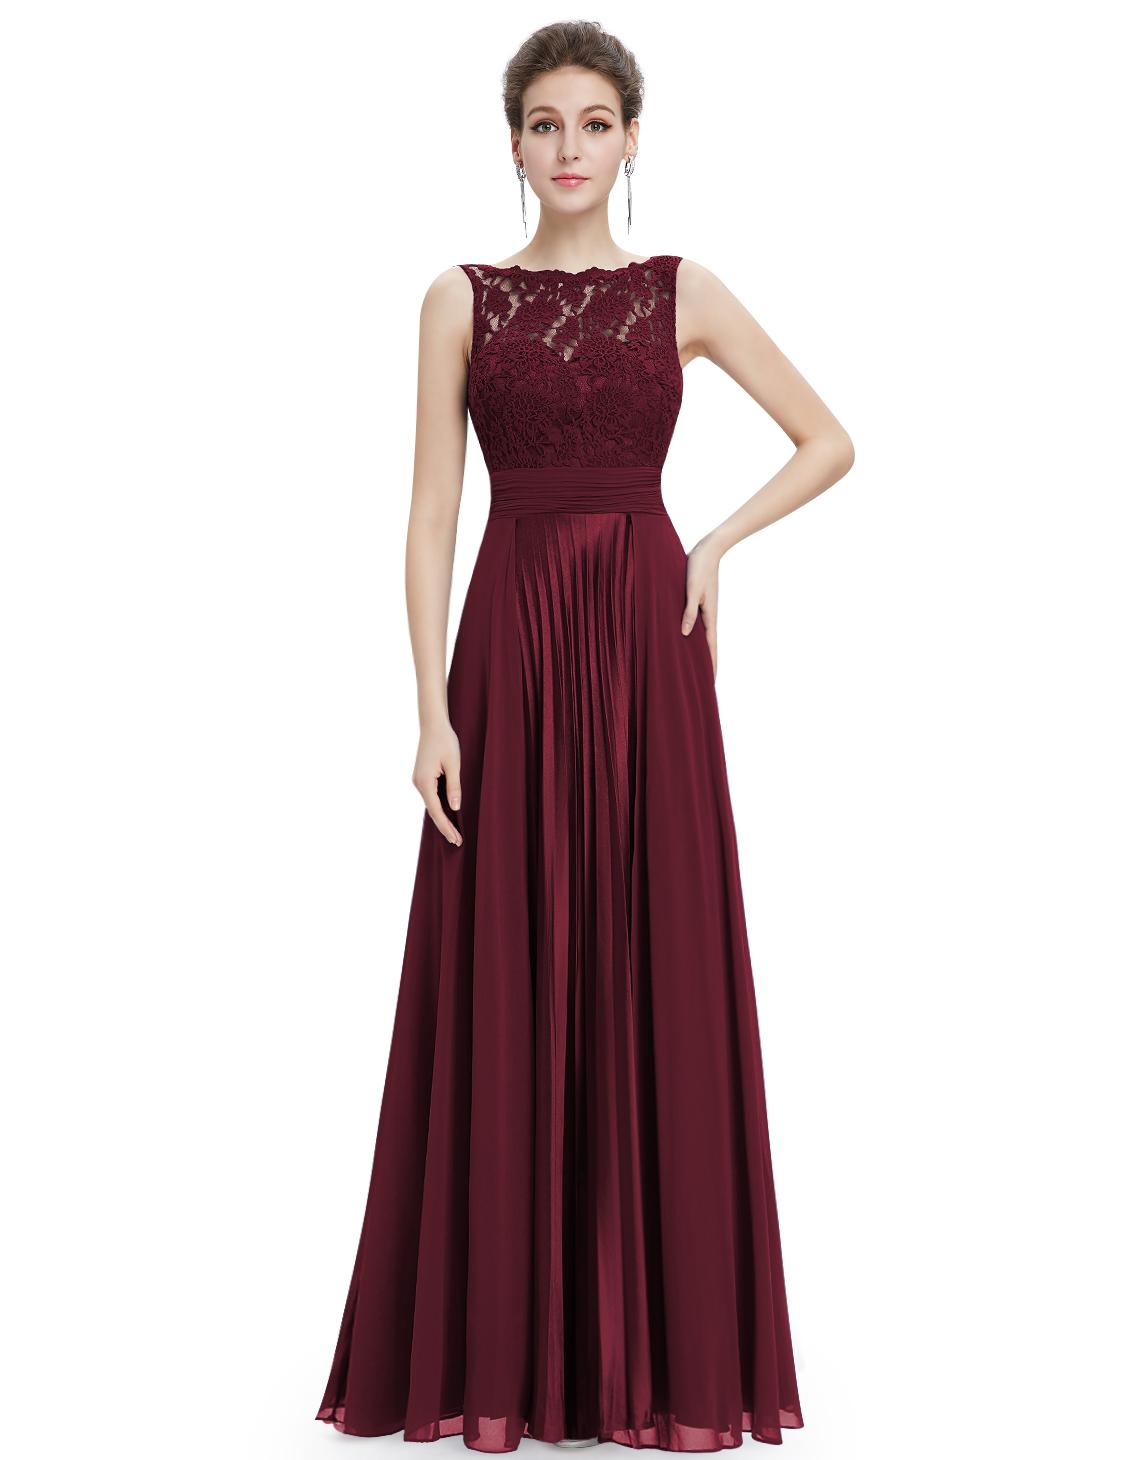 Burgundy Chiffon Sheer Illusion Neckline Lace Bodice Dress With Ruching - $120.00